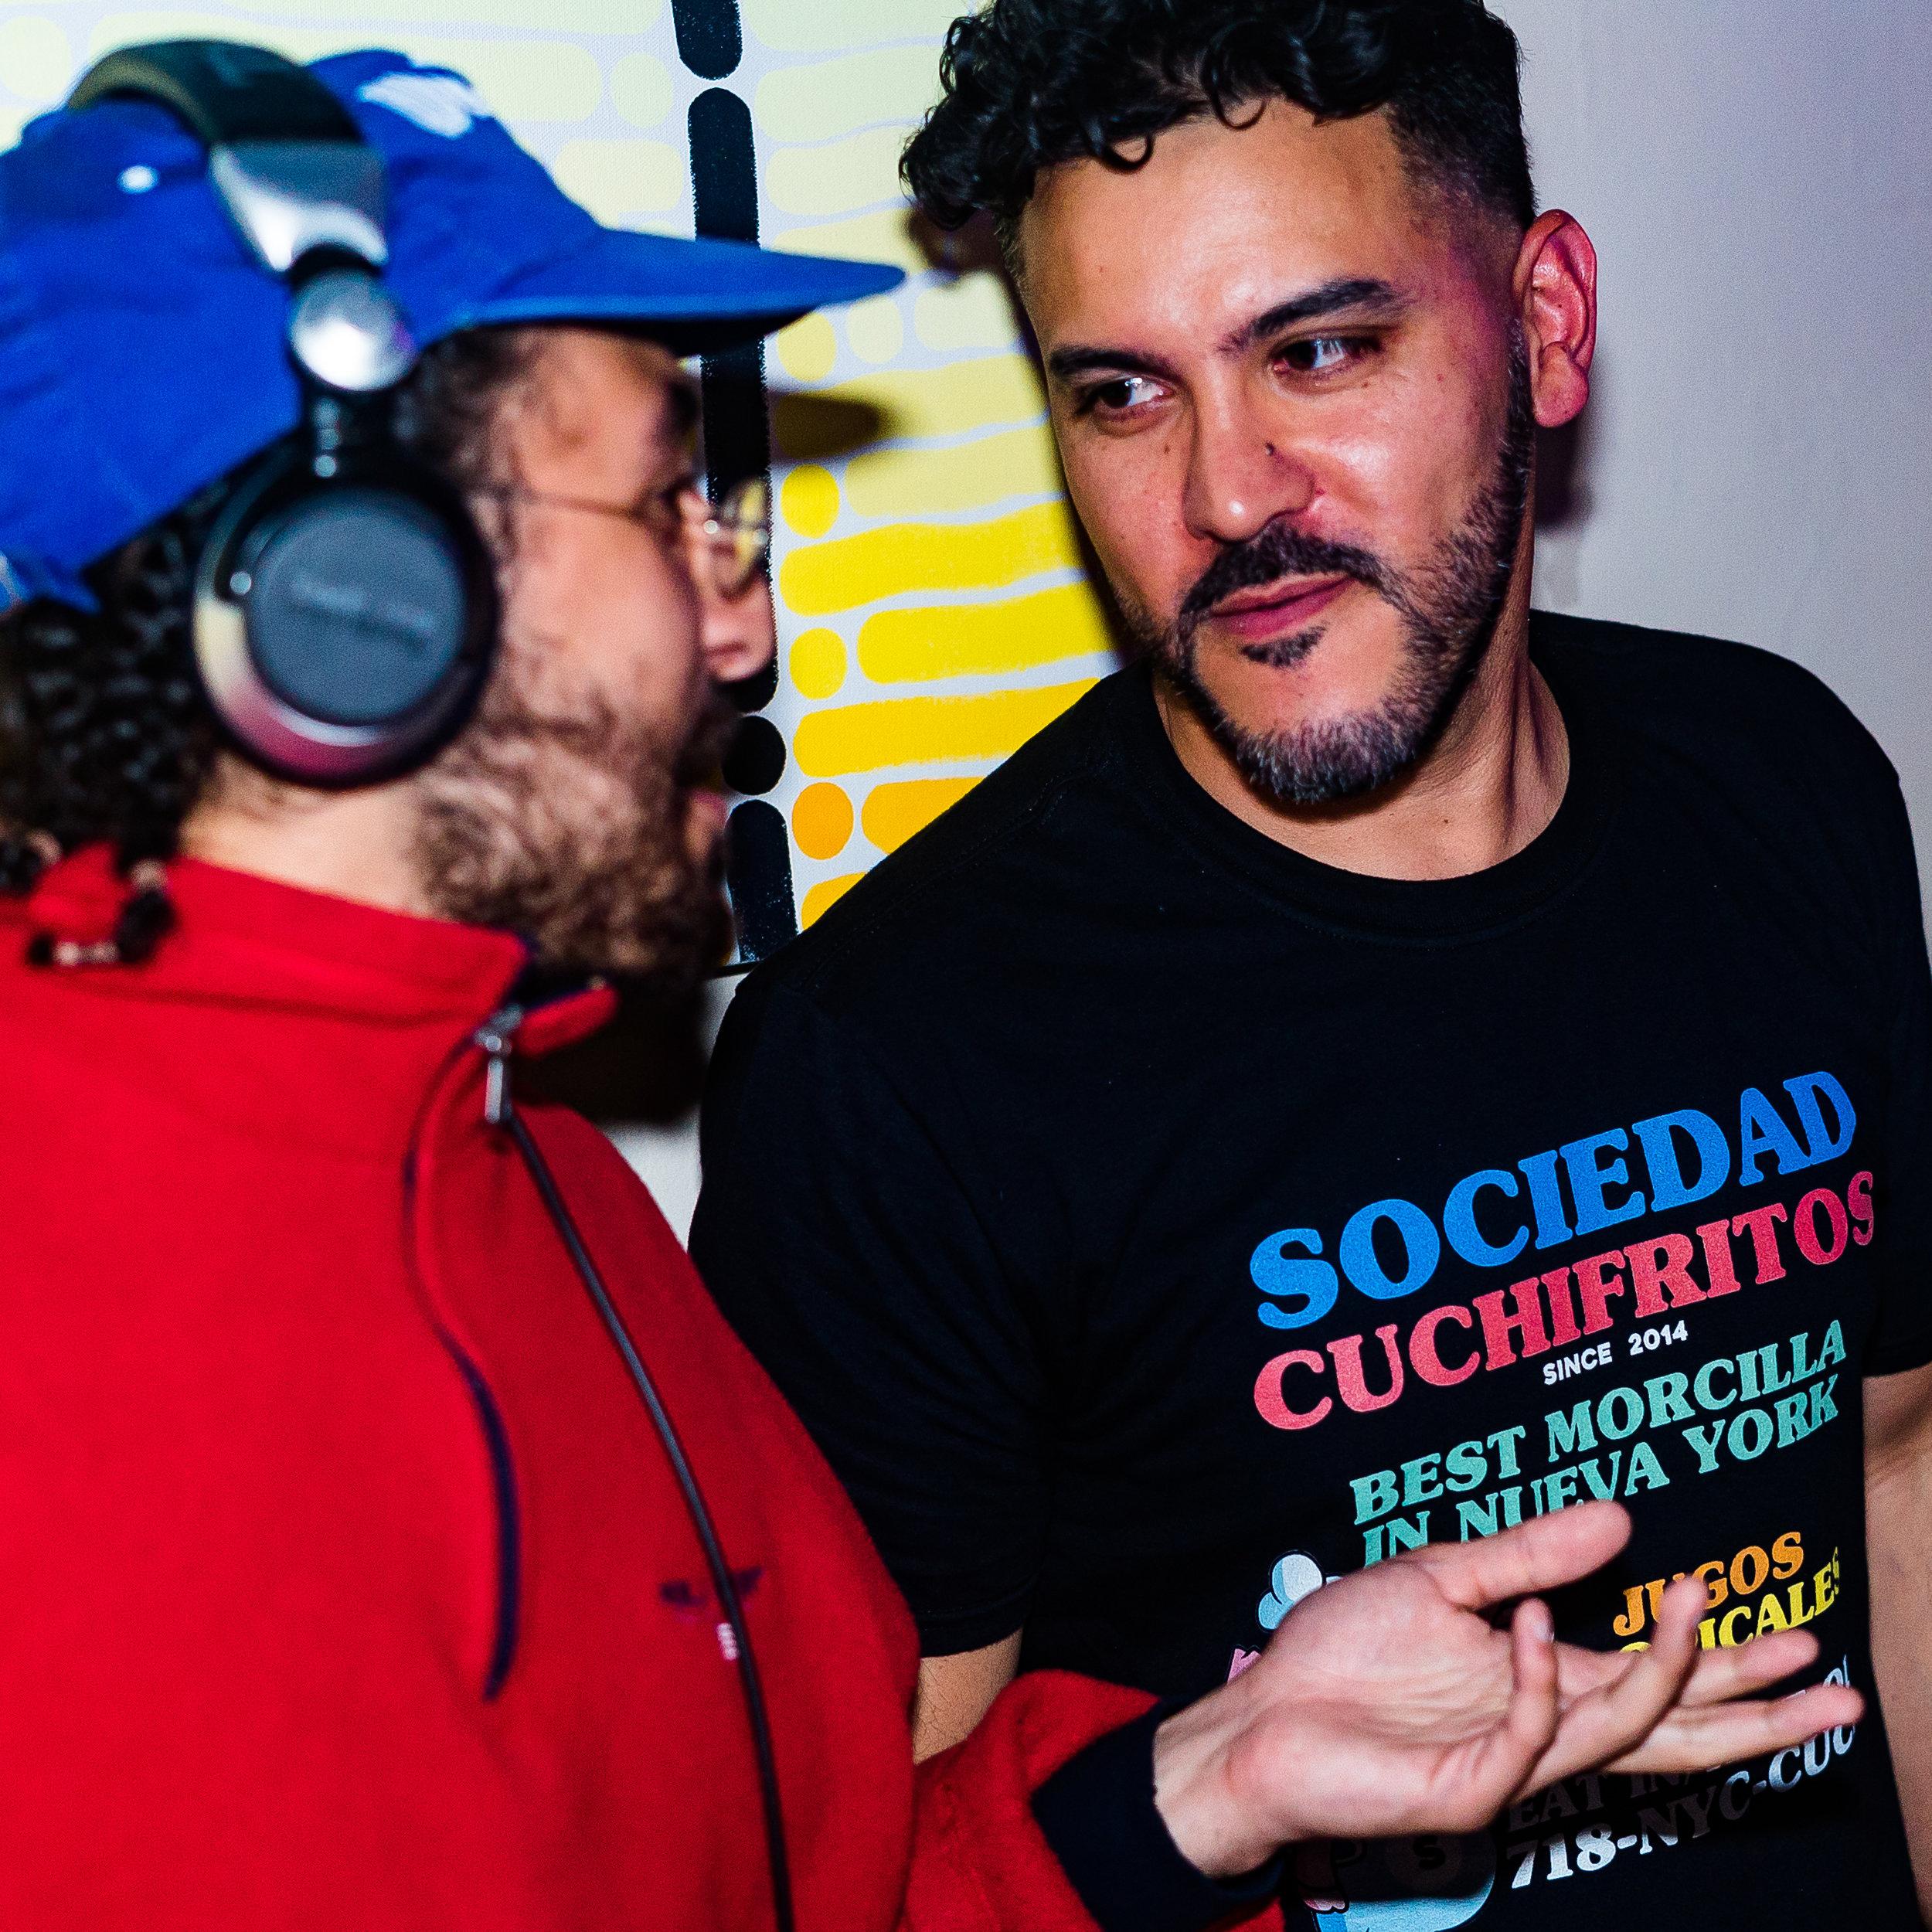 DJ 144-2018 Sociedad Life Cuchifritos_0178.jpg